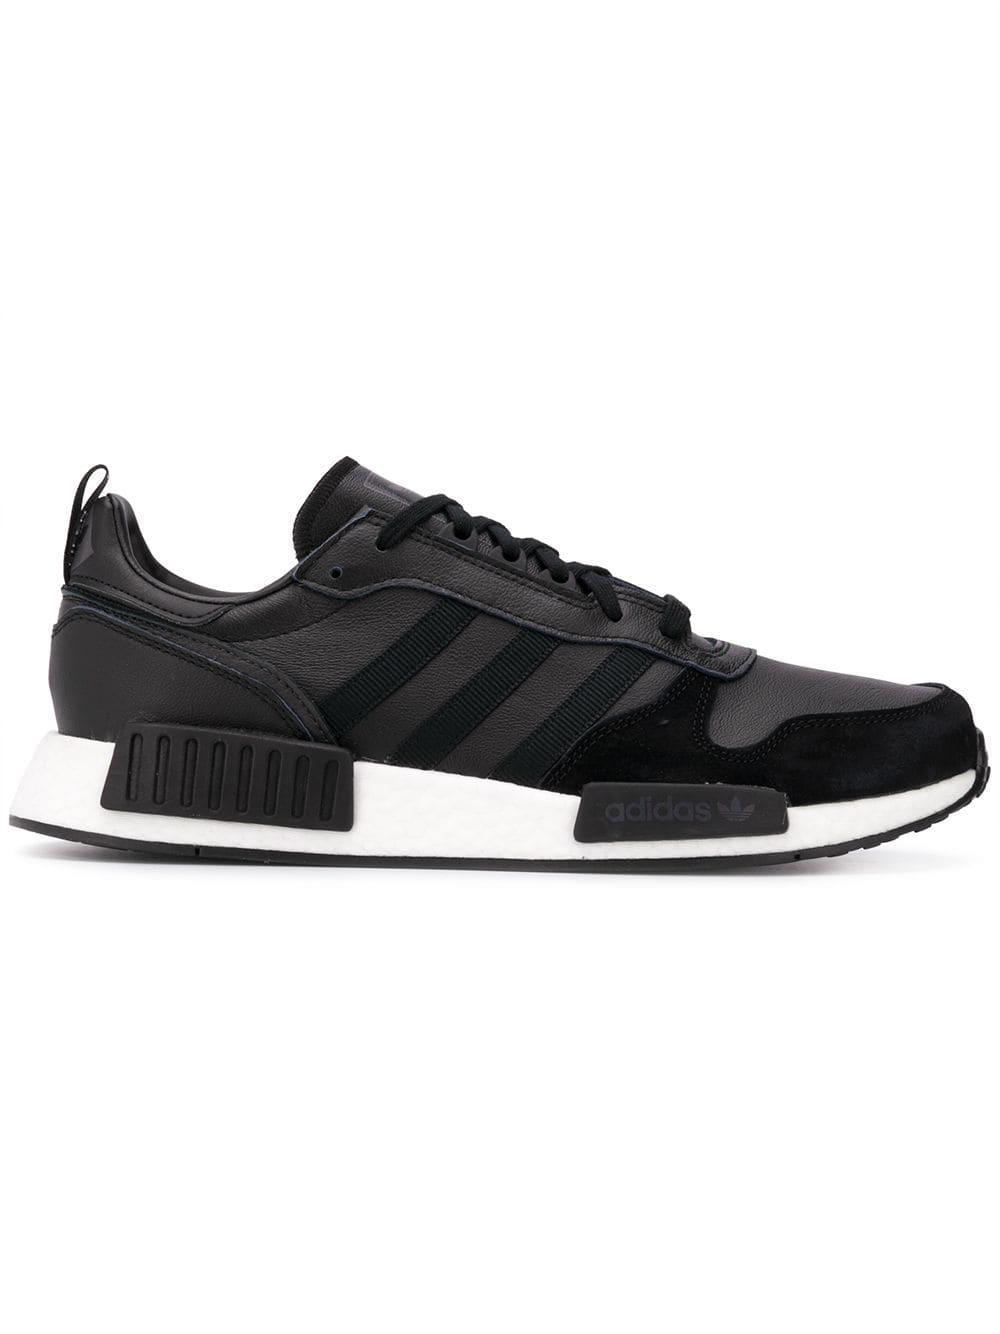 728122e2346cbe Lyst - adidas Rising Starxr1 Sneakers in Black for Men